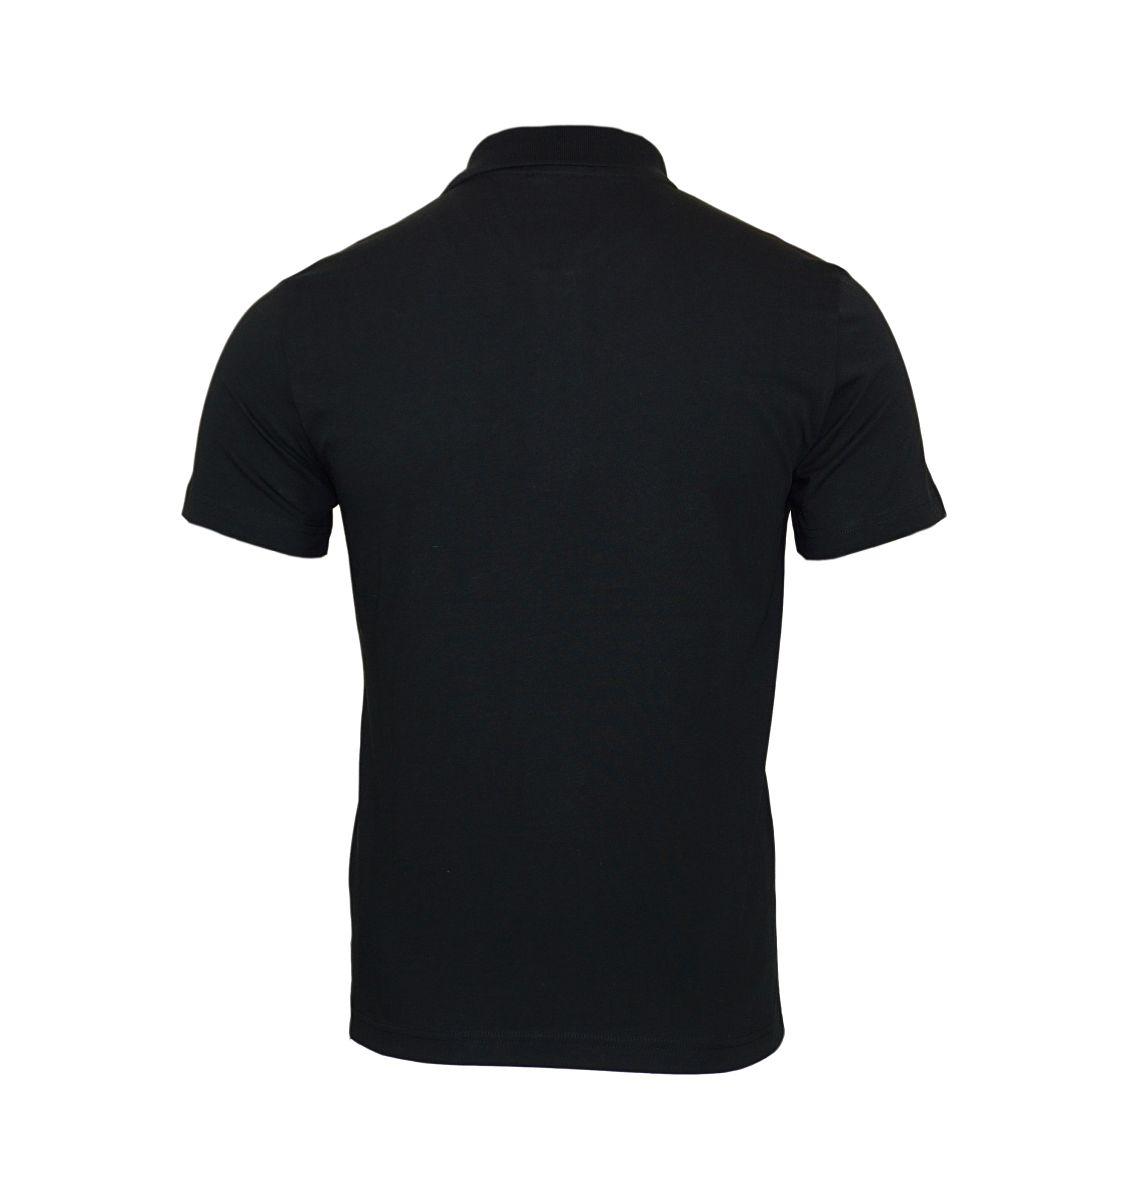 EA7 Emporio Armani Shirt Poloshirt 8NPF01 PJ48Z 1200 Black HW17-EAPS1